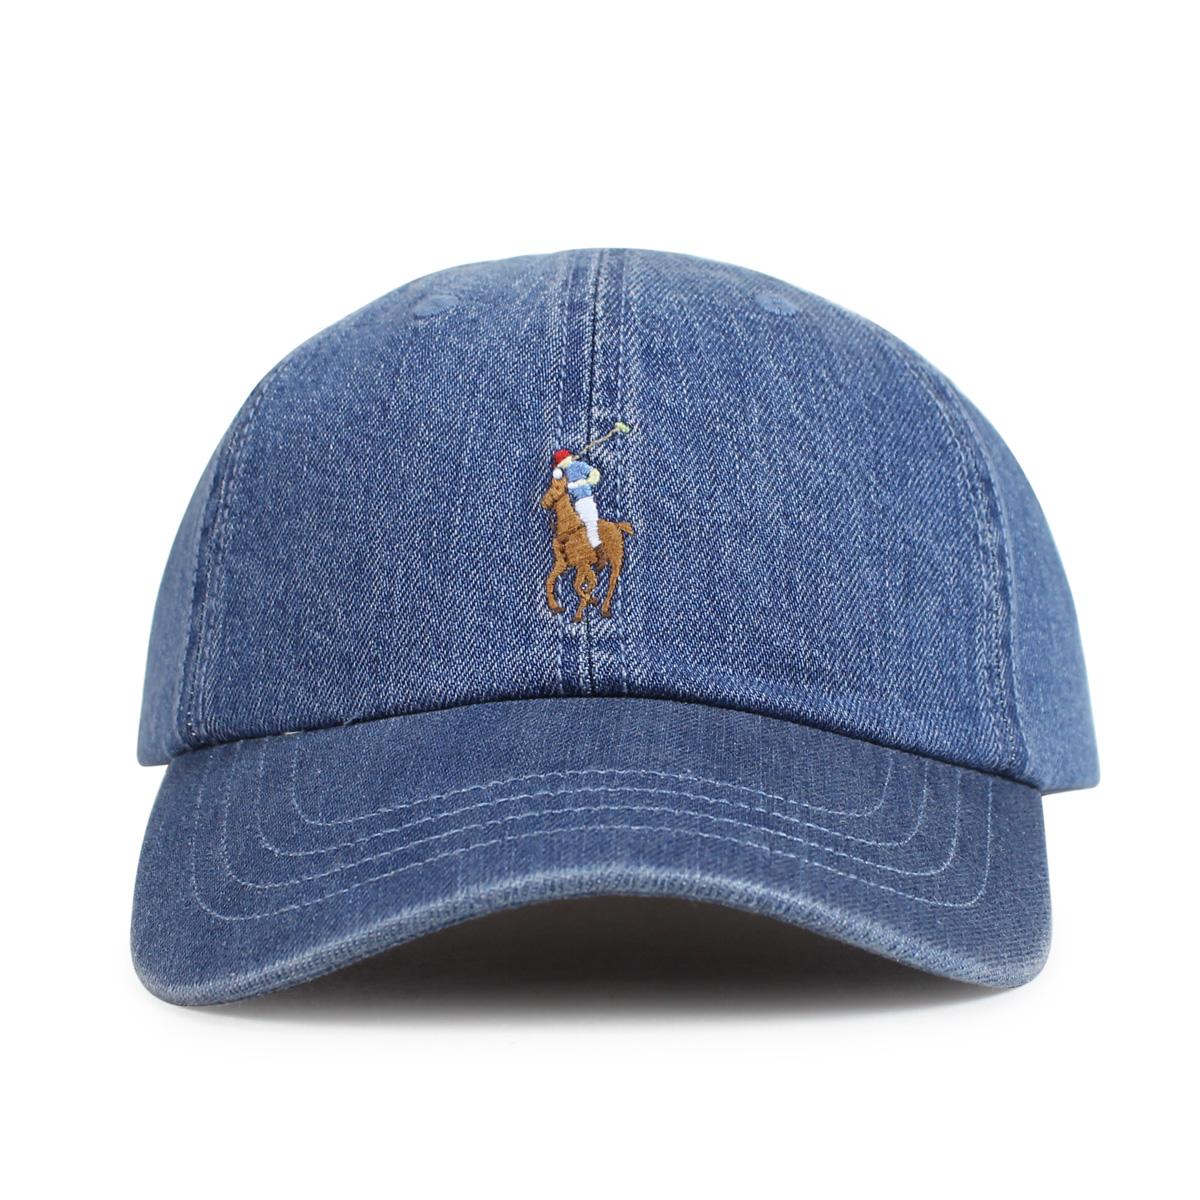 POLO RALPH LAUREN DENIM BASEBALL CAP polo Ralph Lauren cap hat men gap Dis  cotton denim 710674341001  1 15 Shinnyu load   191  89896c0beb9